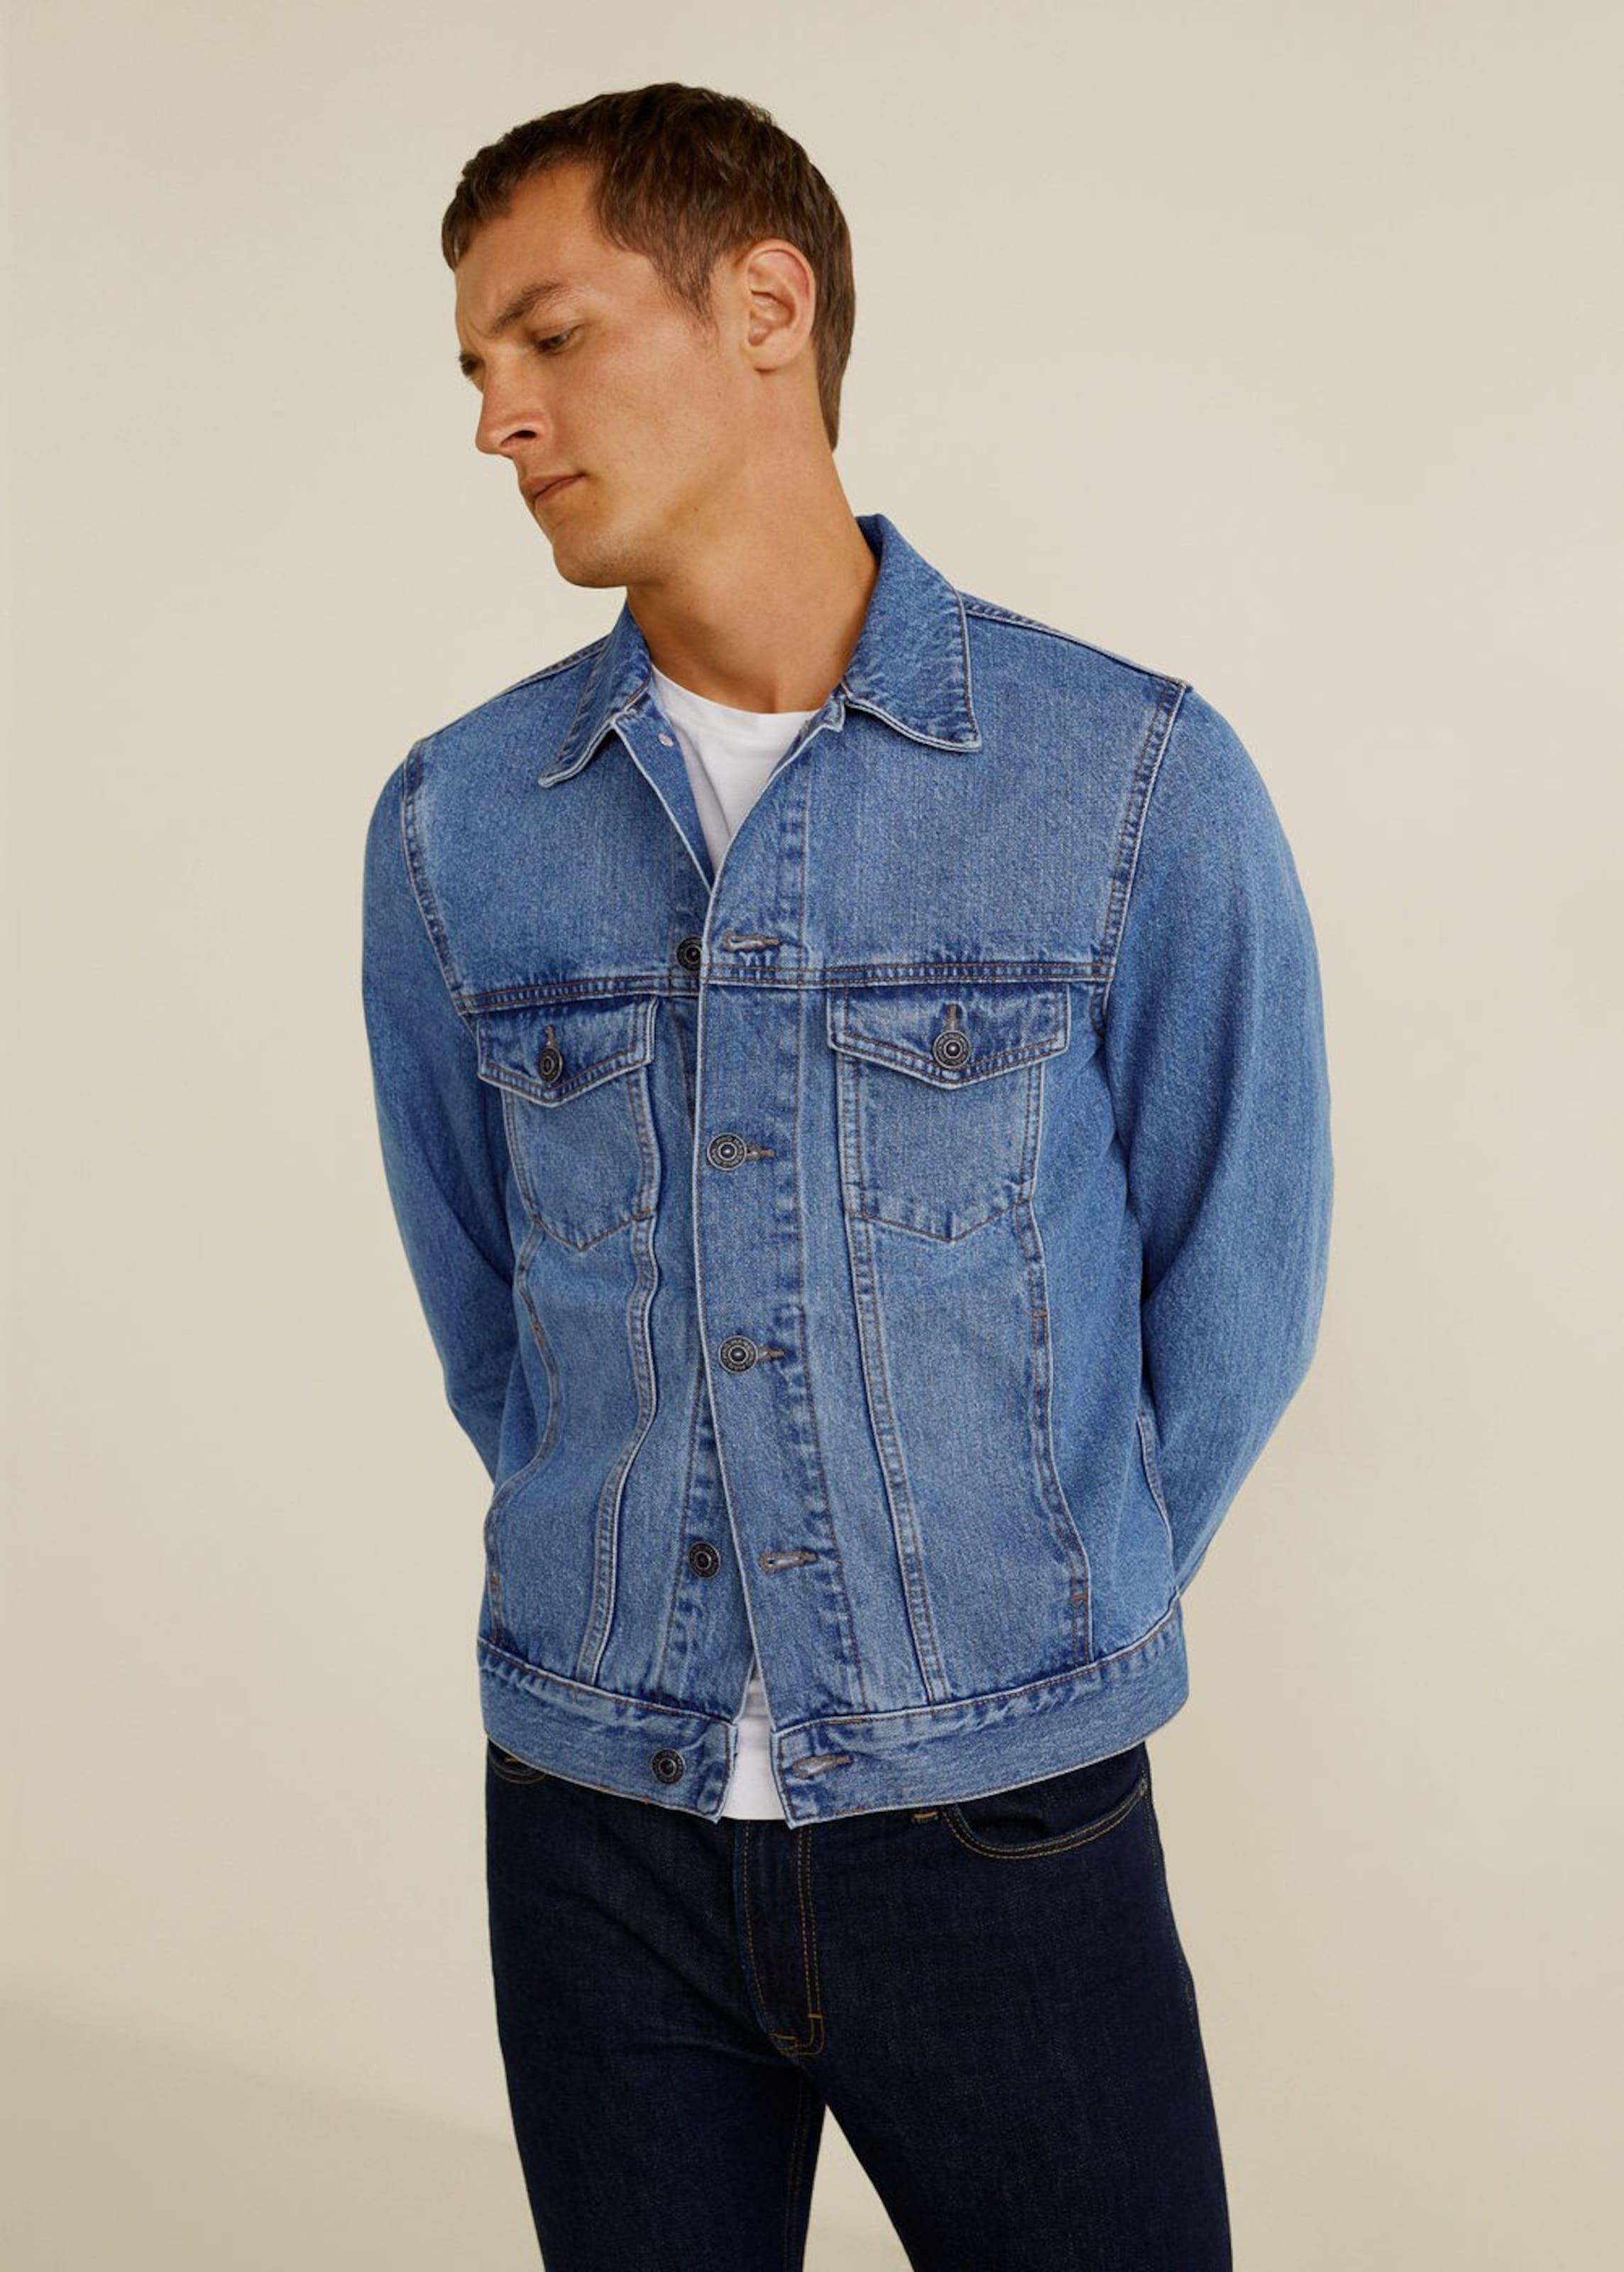 Mango 'ryan5' Man Denim Jacke In Blue LVpUzGSqM